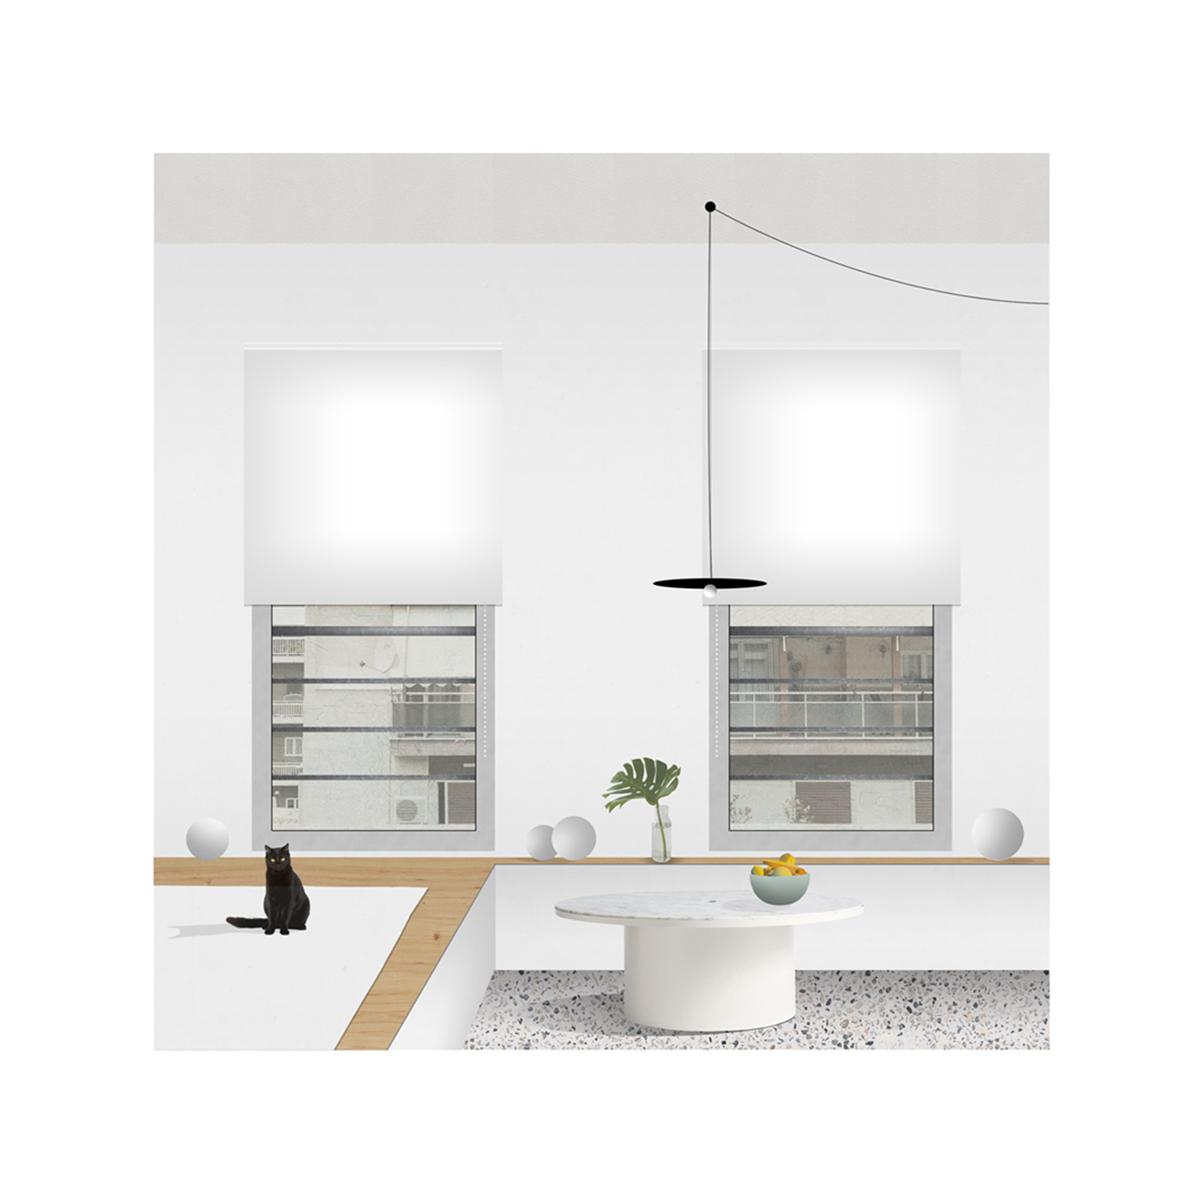 6 Apartments_06.jpg